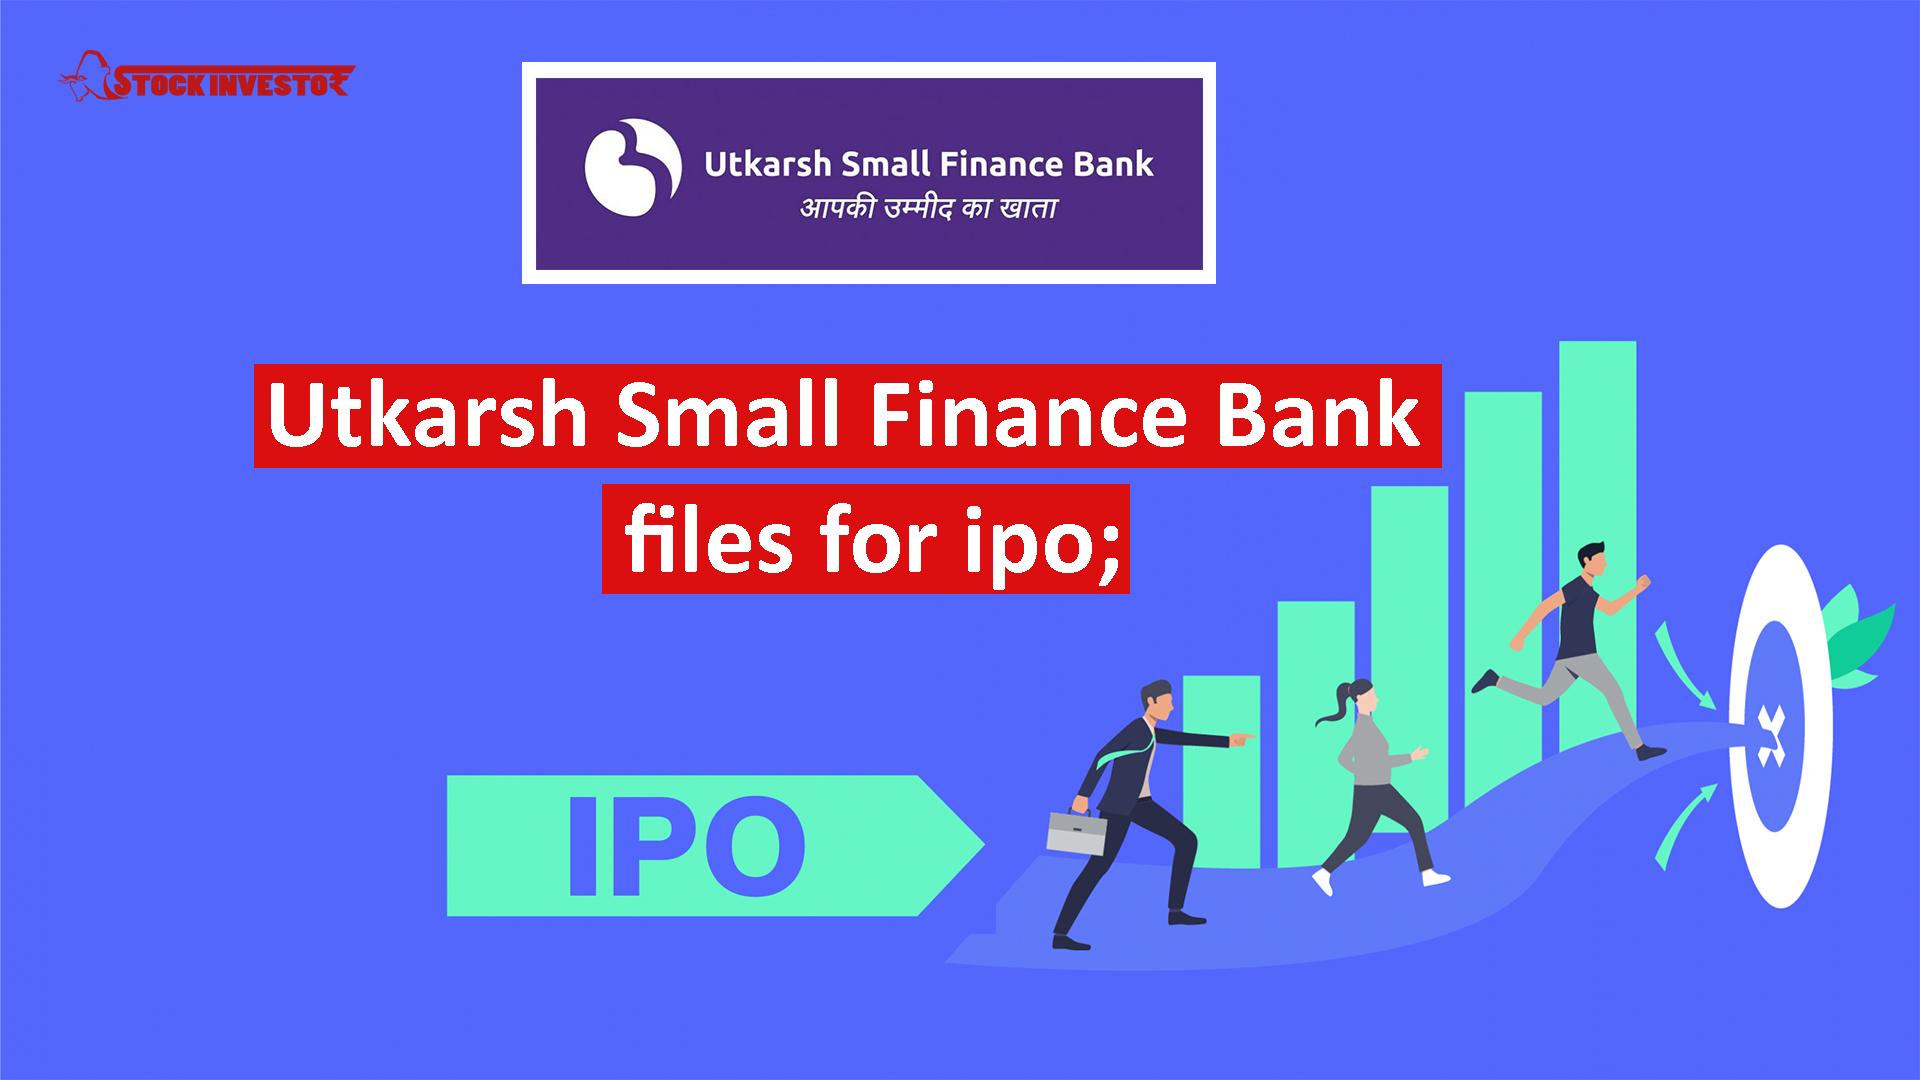 Utkarsh Small Finance Bank  files for ipo;